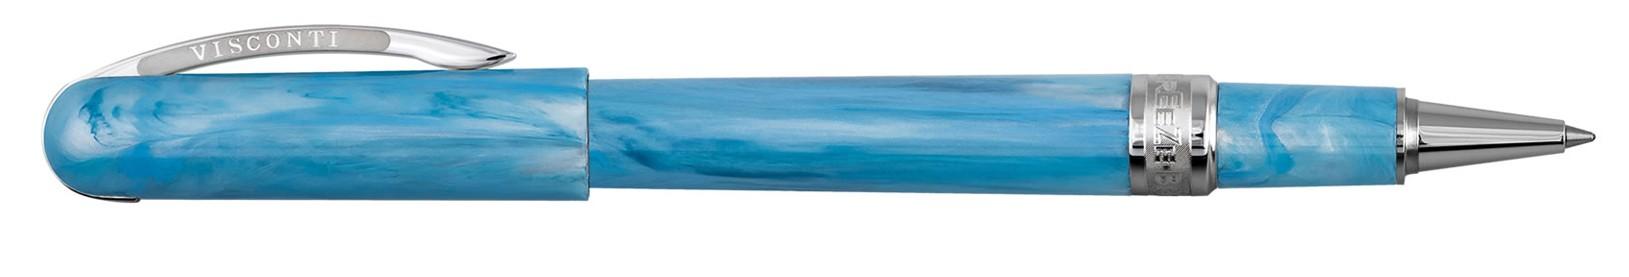 Visconti Breeze Blueberry Rollerball Pen